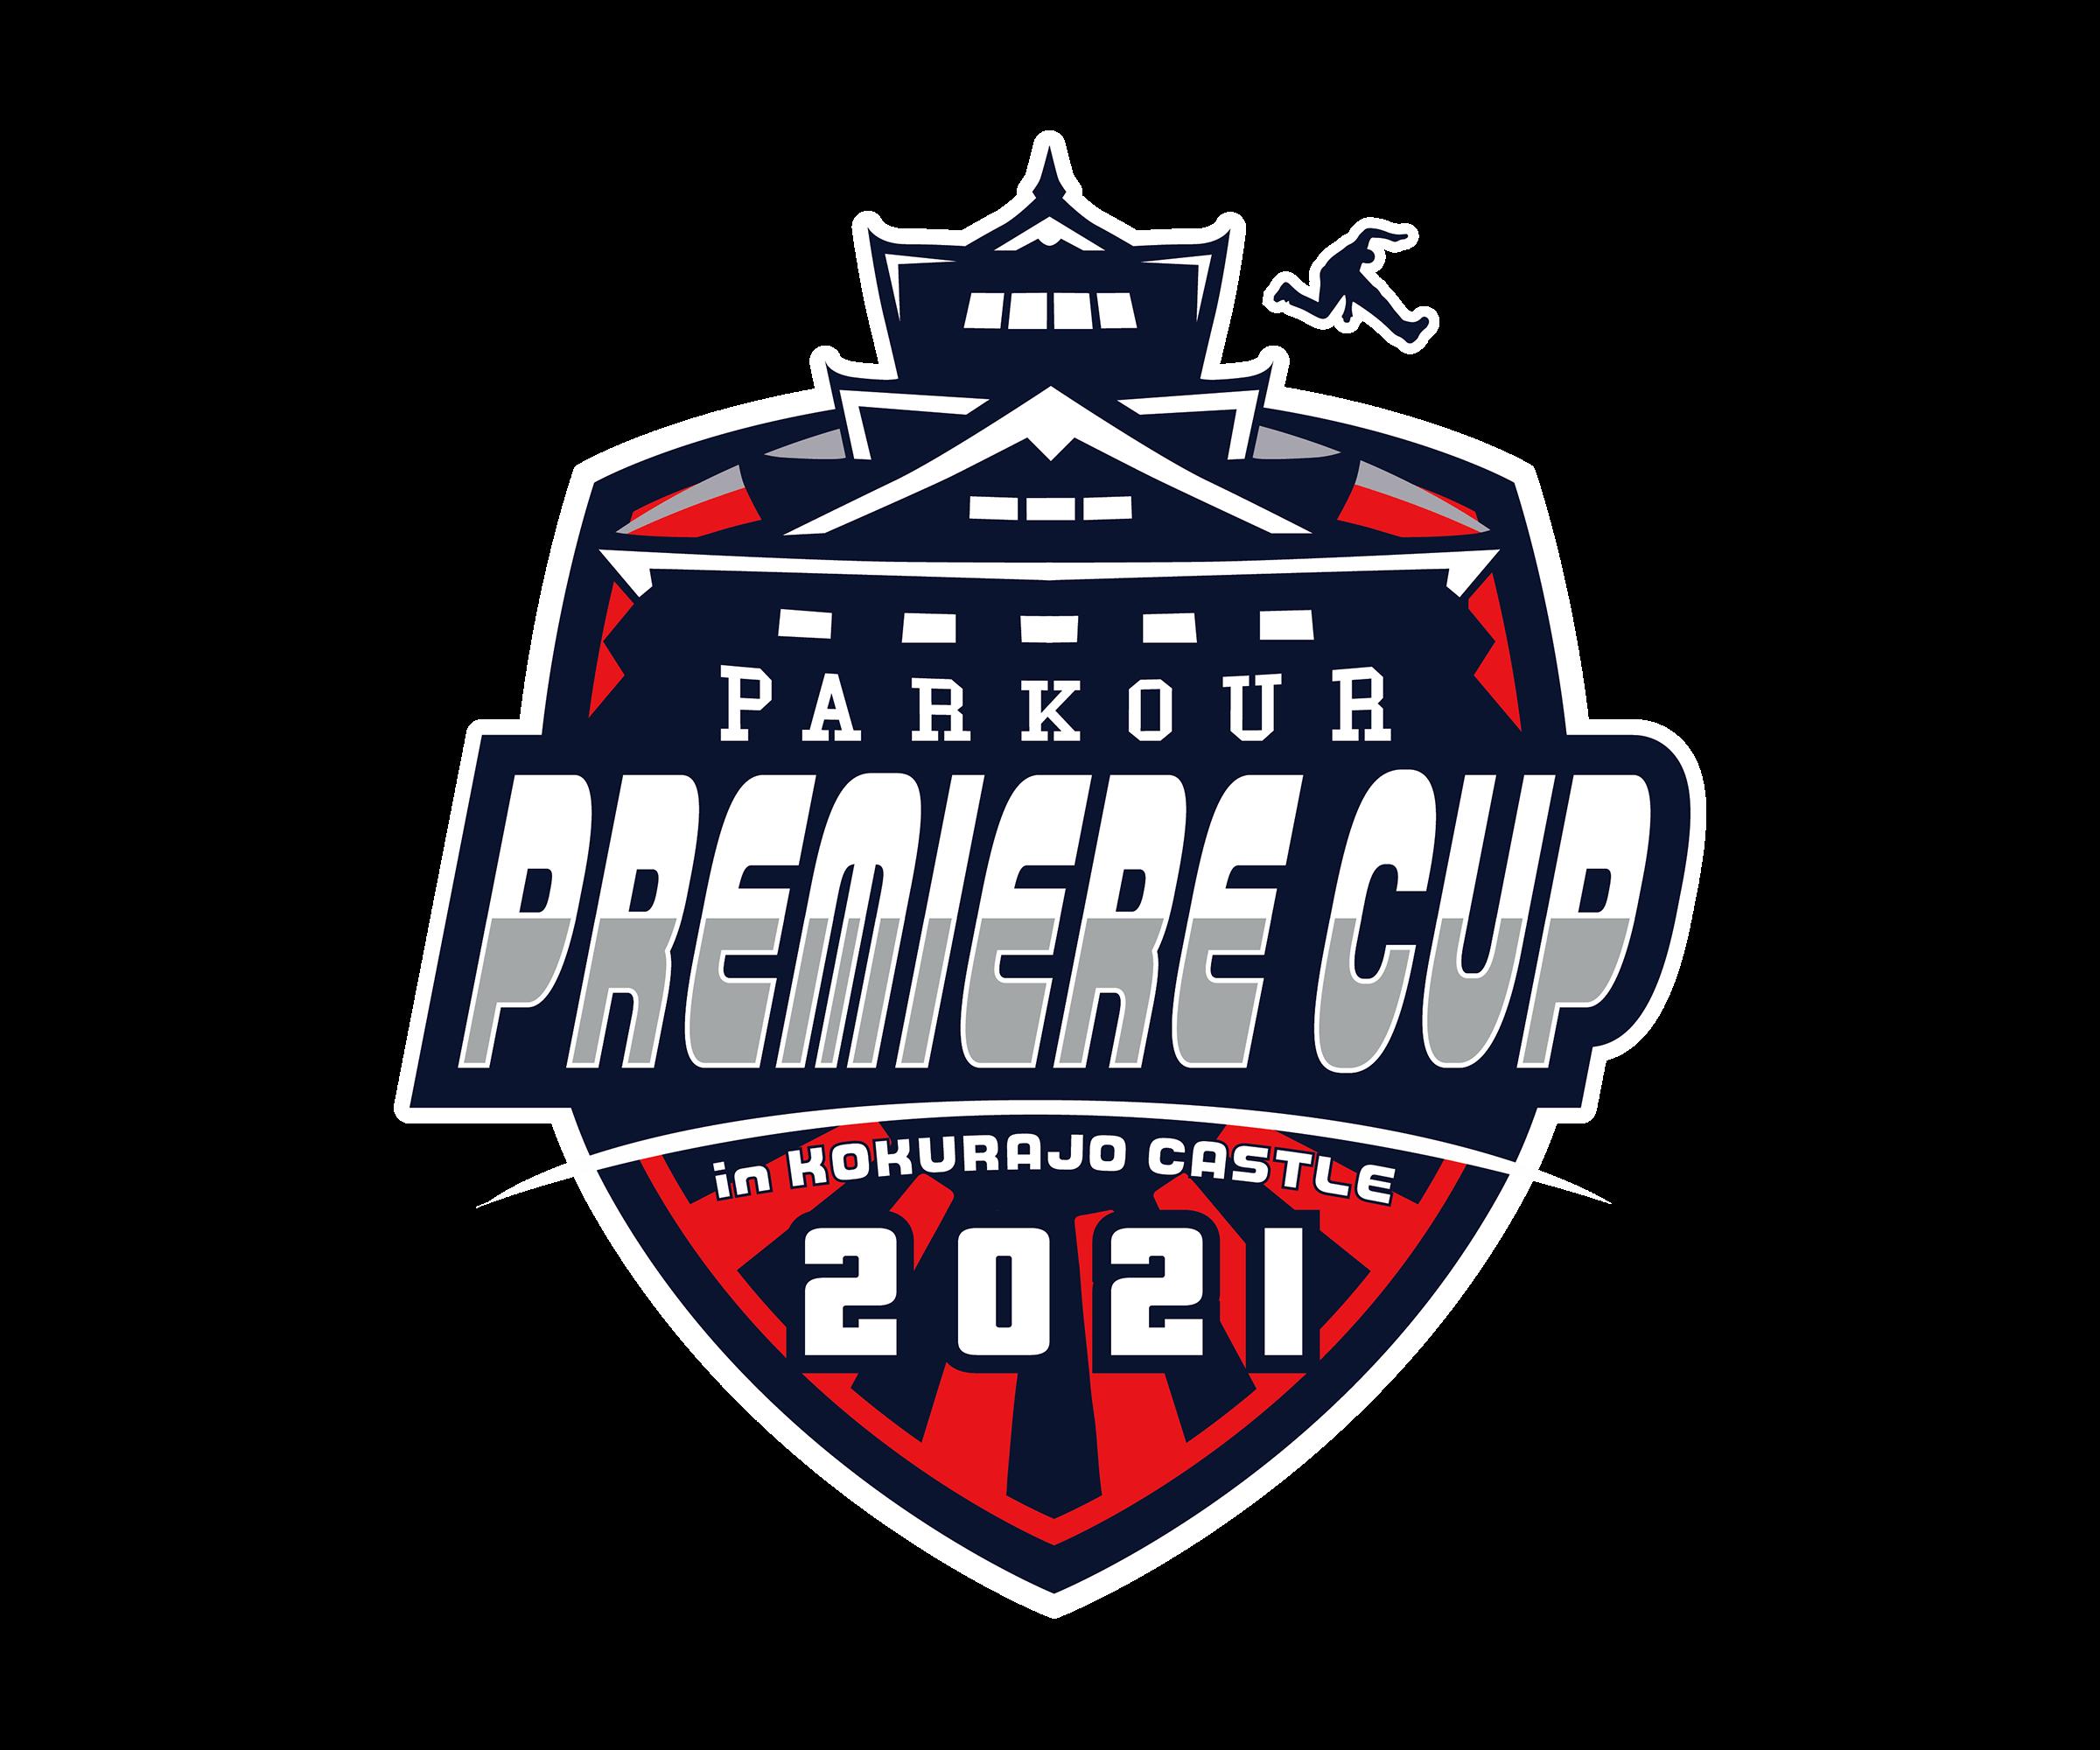 PARKOUR PREMIERE CUP 2021 in KOKURAJO CASTLE